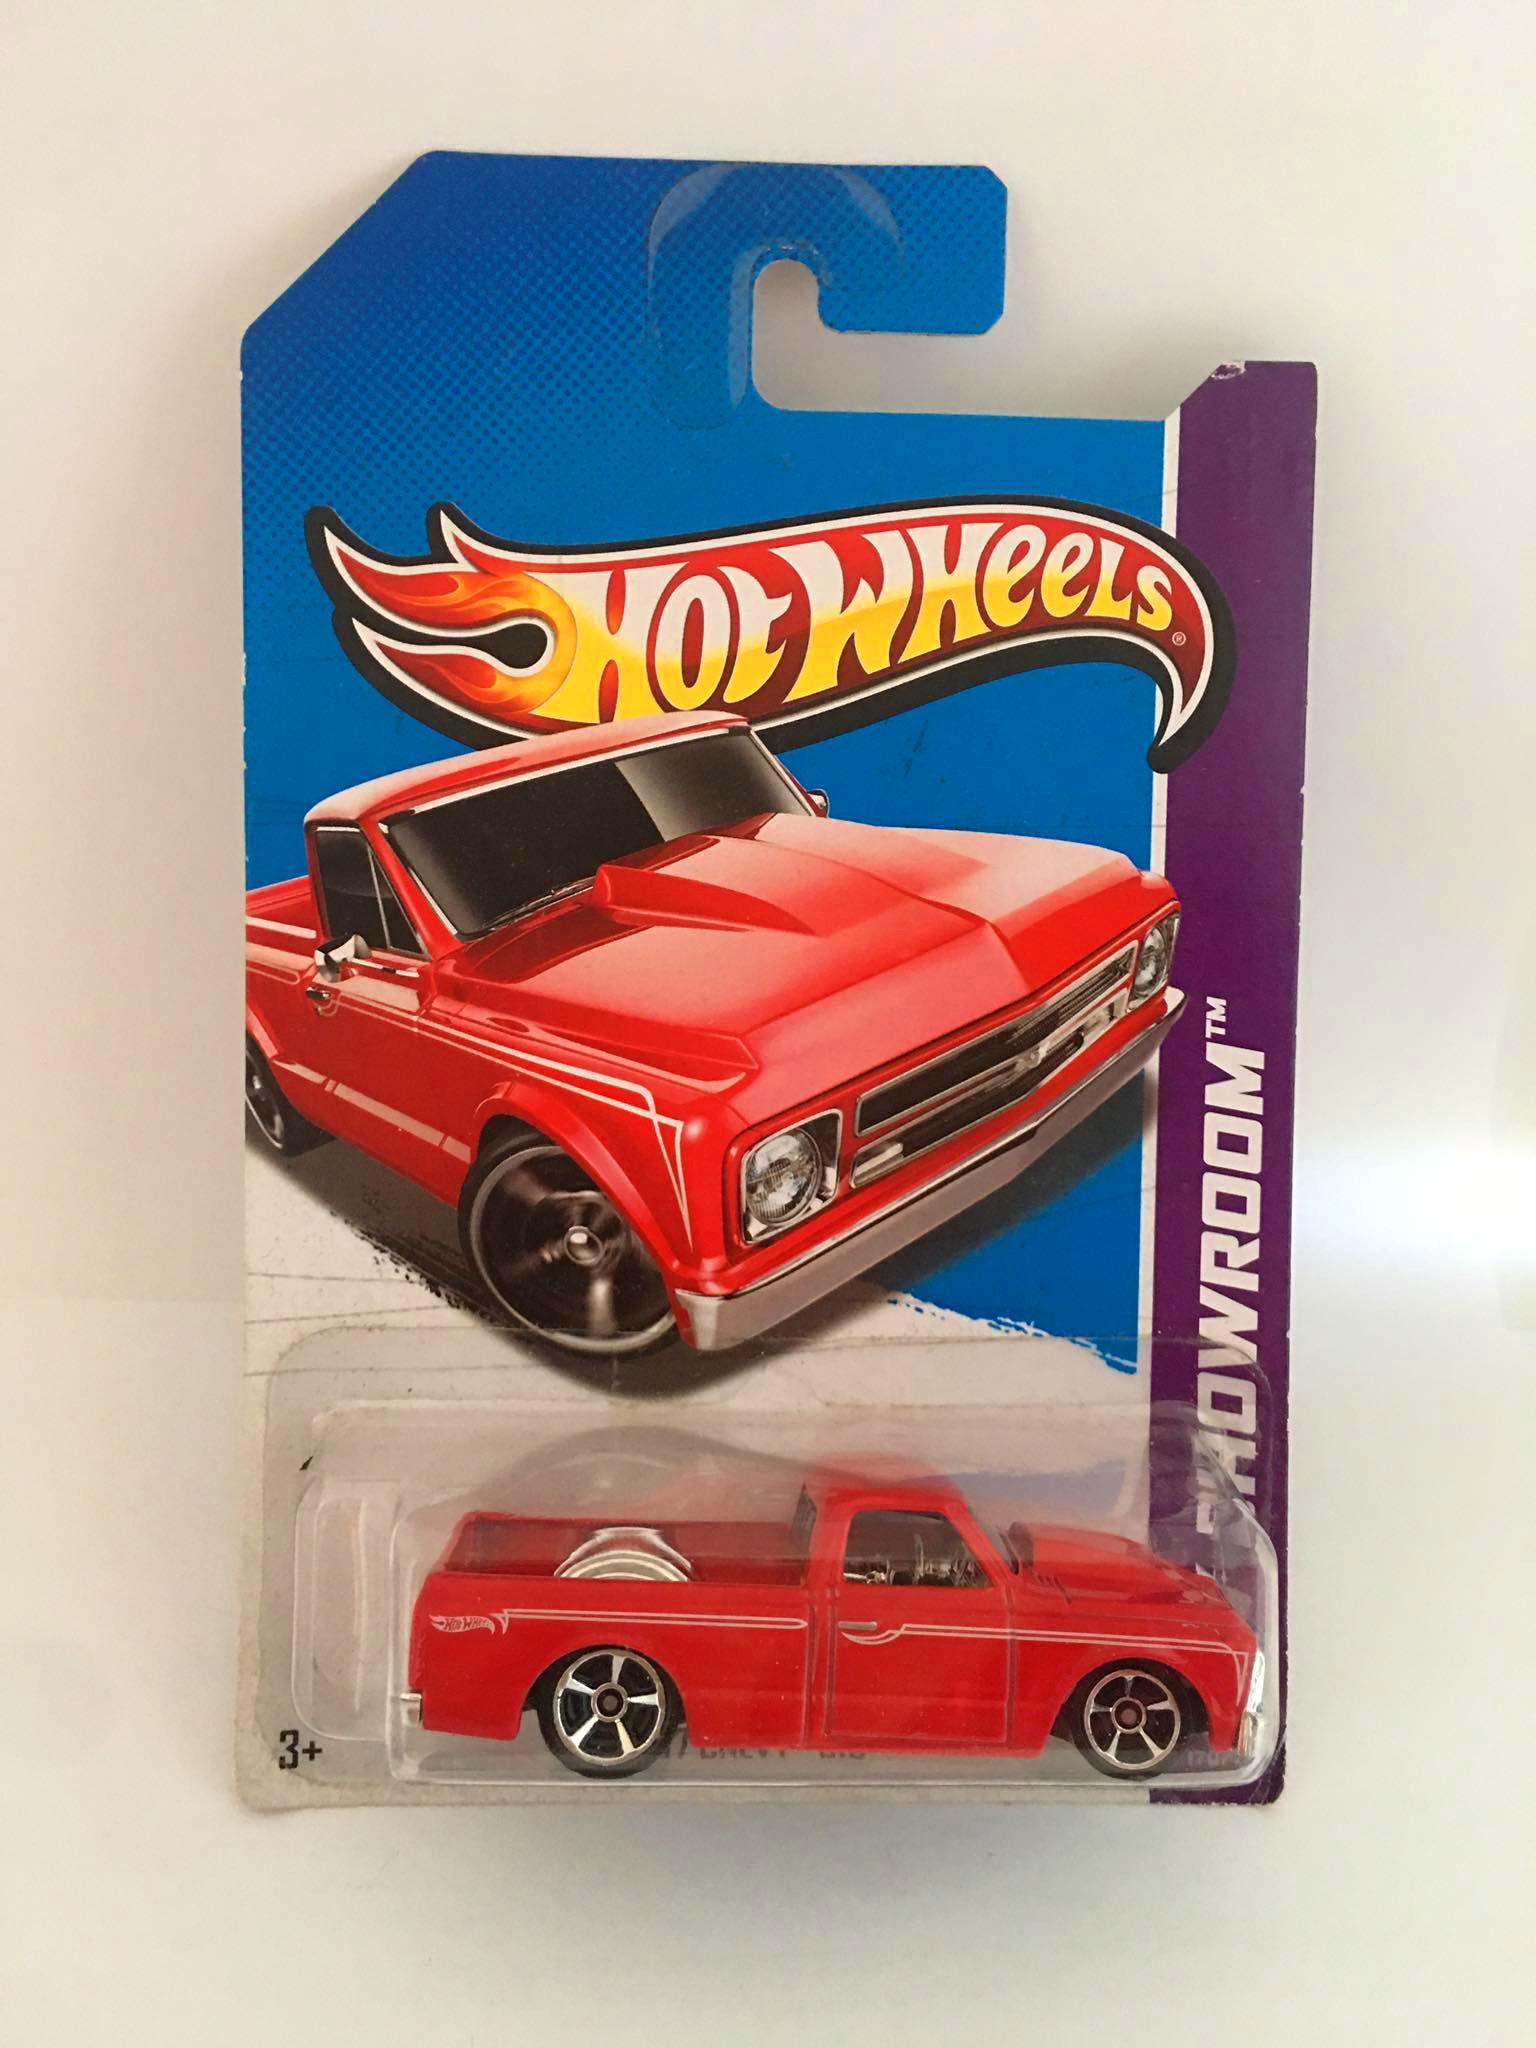 Hot Wheels - 67 Chevy C10 Vermelho - Mainline 2013